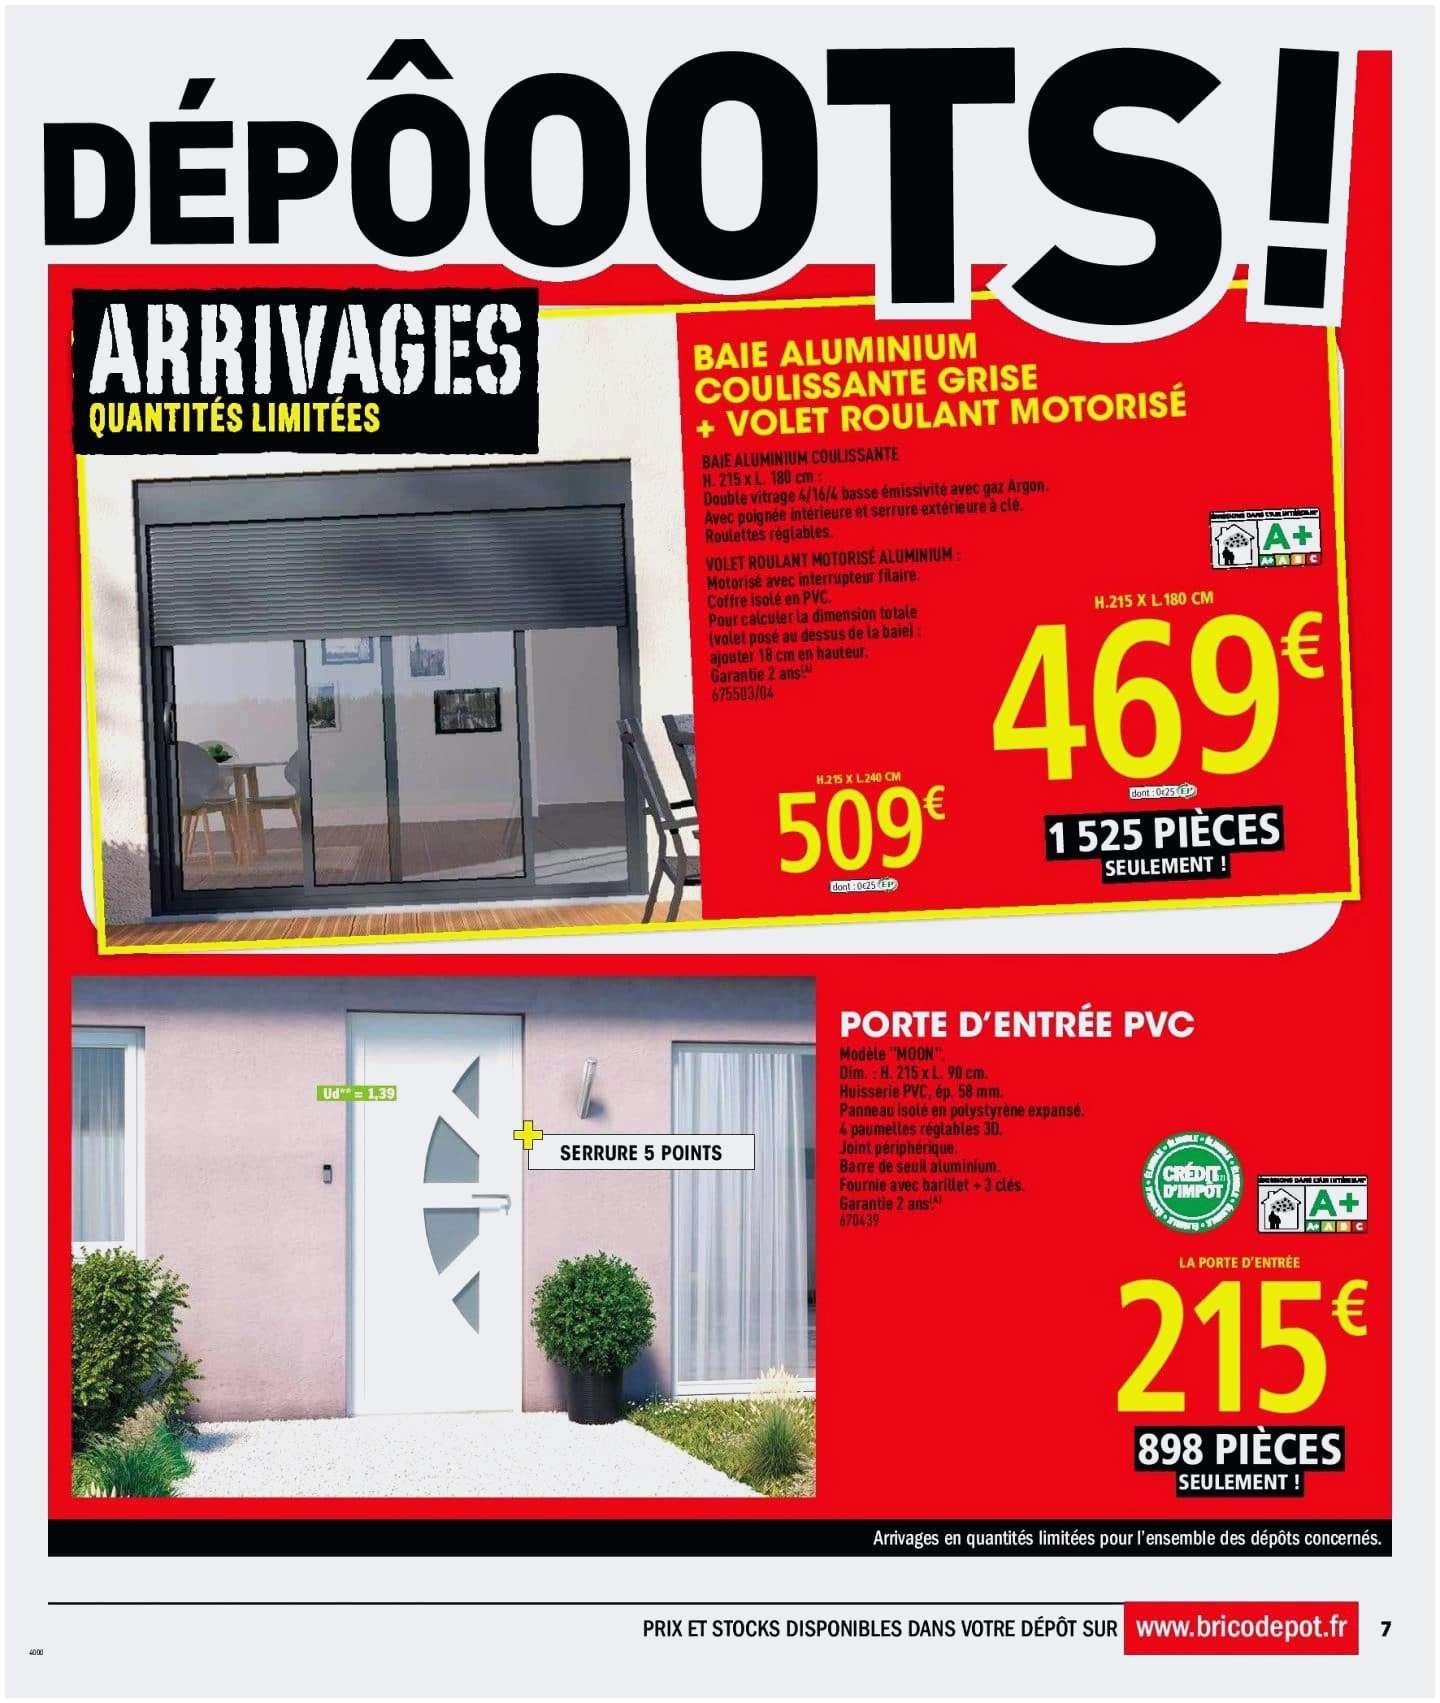 Roue Portail Coulissant Brico Depot – Gamboahinestrosa pour Roue Pour Portail Coulissant Brico Depot